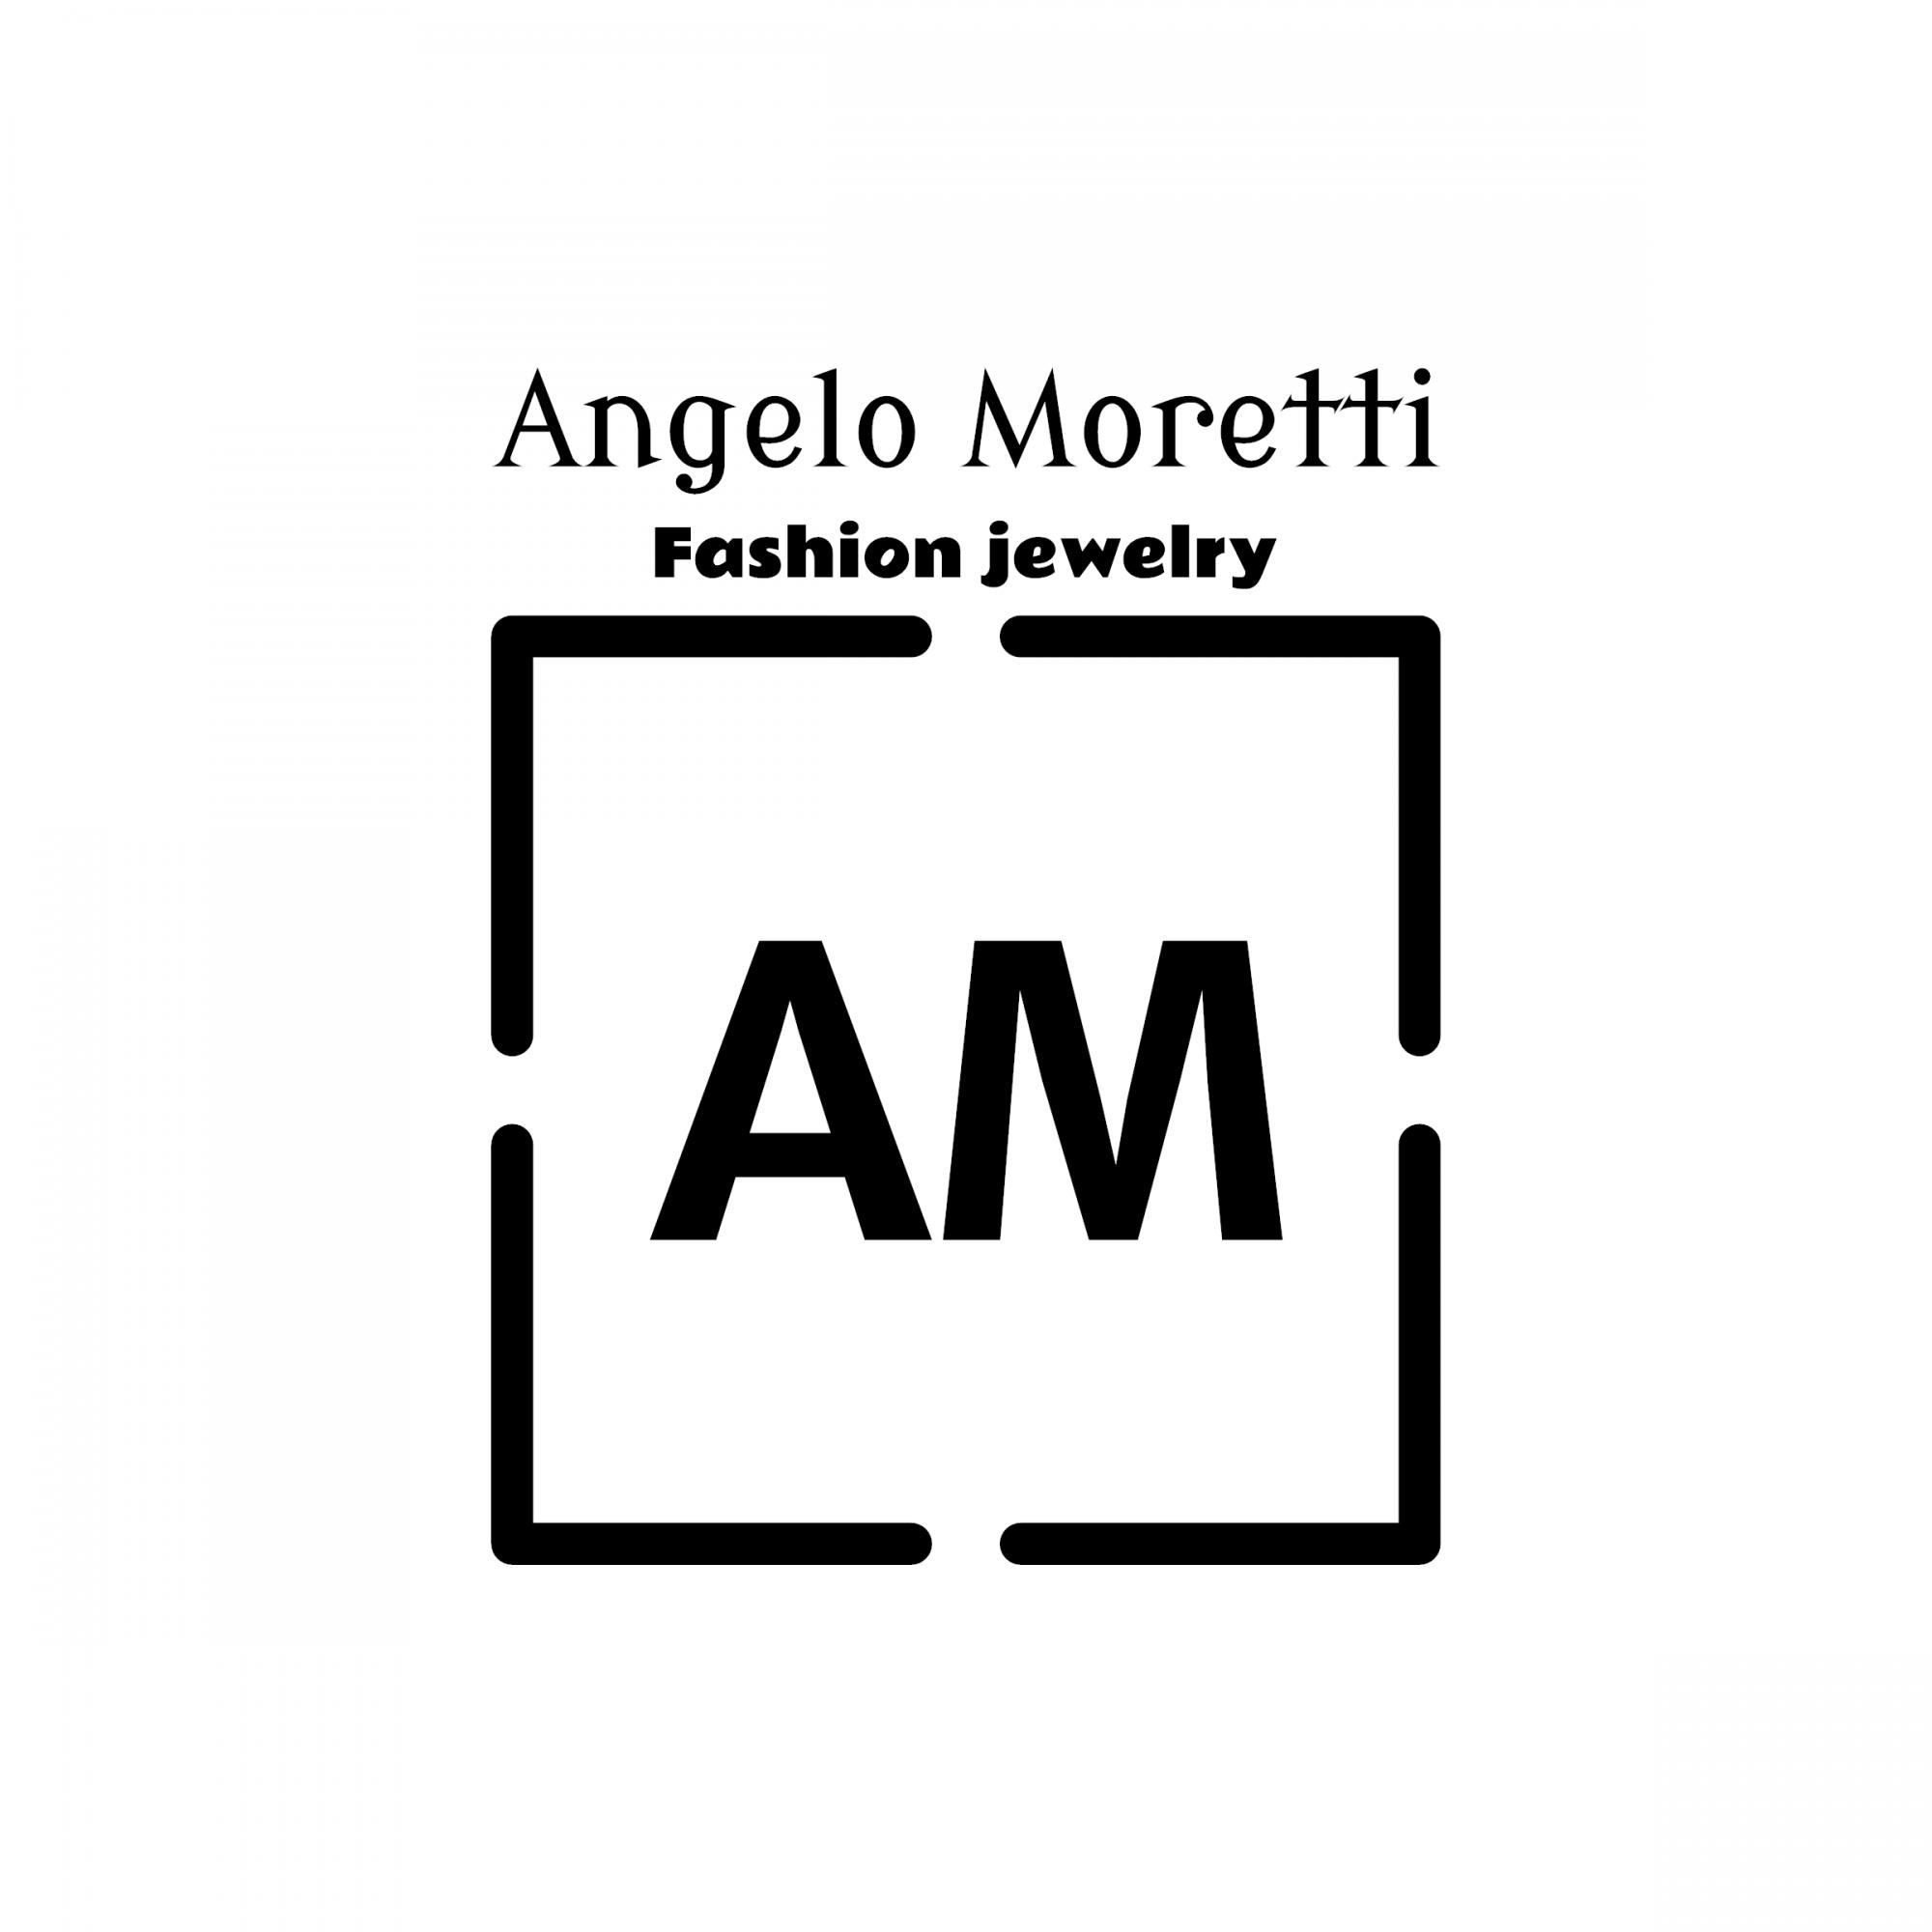 Angelo Moretti Jewelry